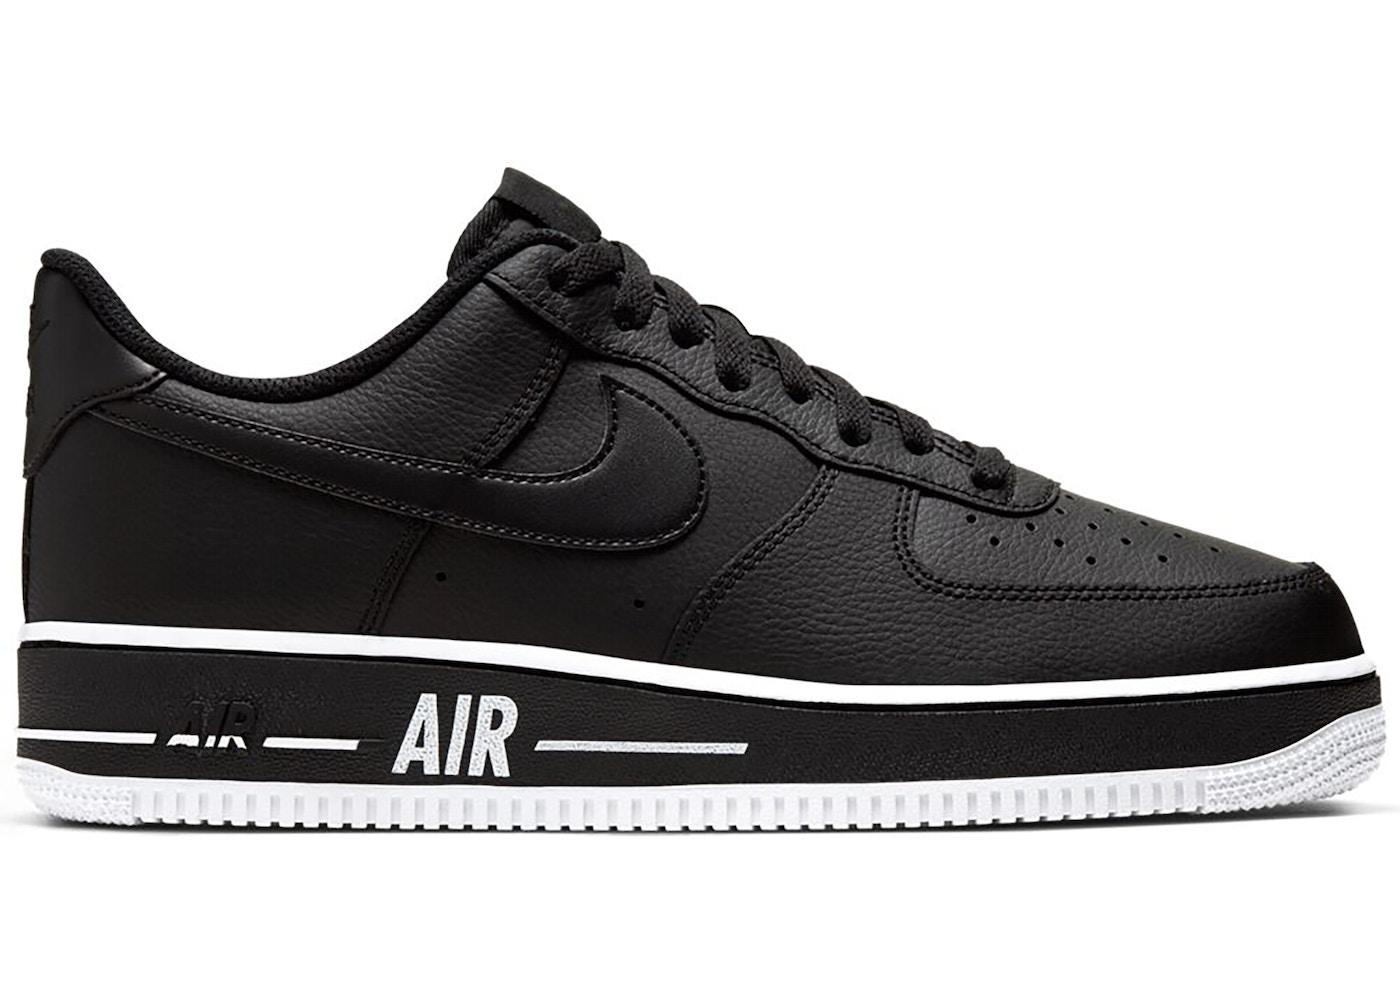 Nike Air Force 1 Low Bold Air Black White